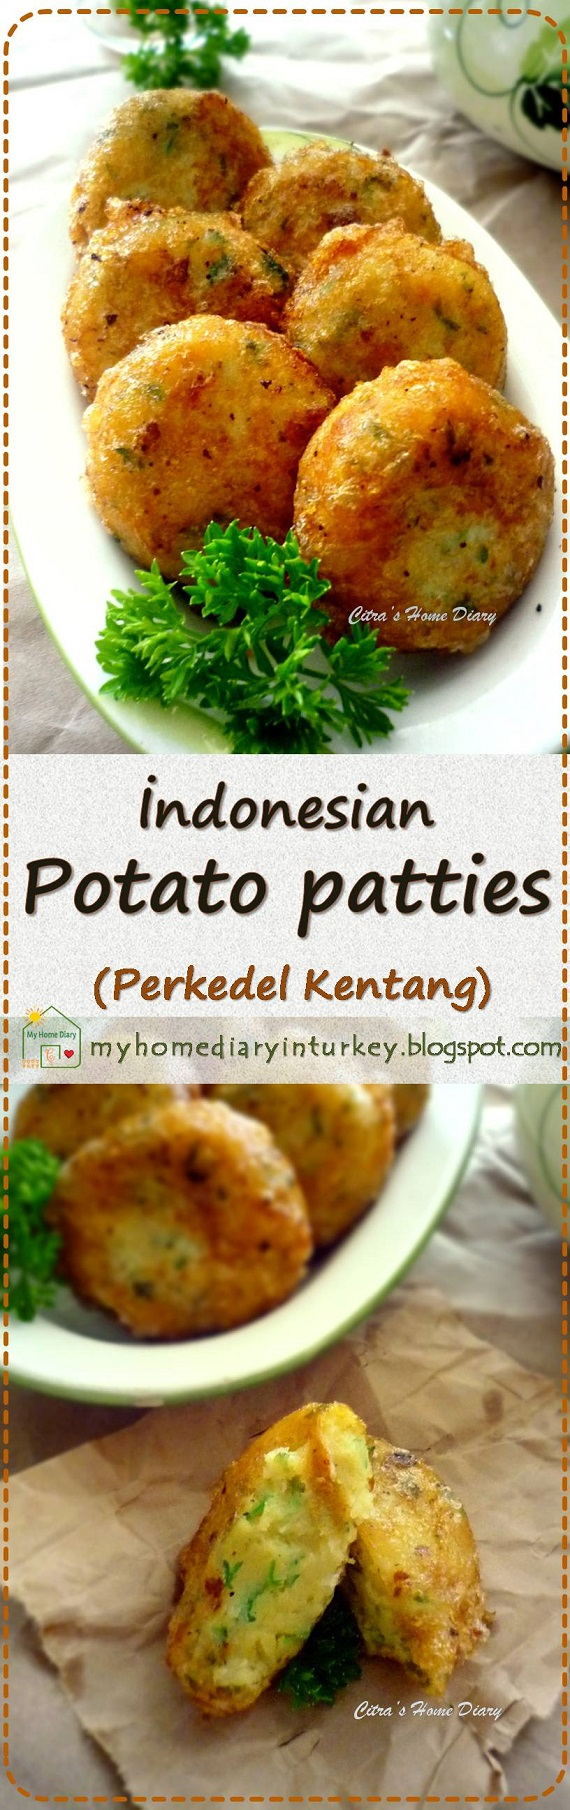 Perkedel Kentang (Indonesian style potato patties) | Çitra's Home Diary. #potatoe #perkedel #vegan #asianfood #indonesianfood #sidedish